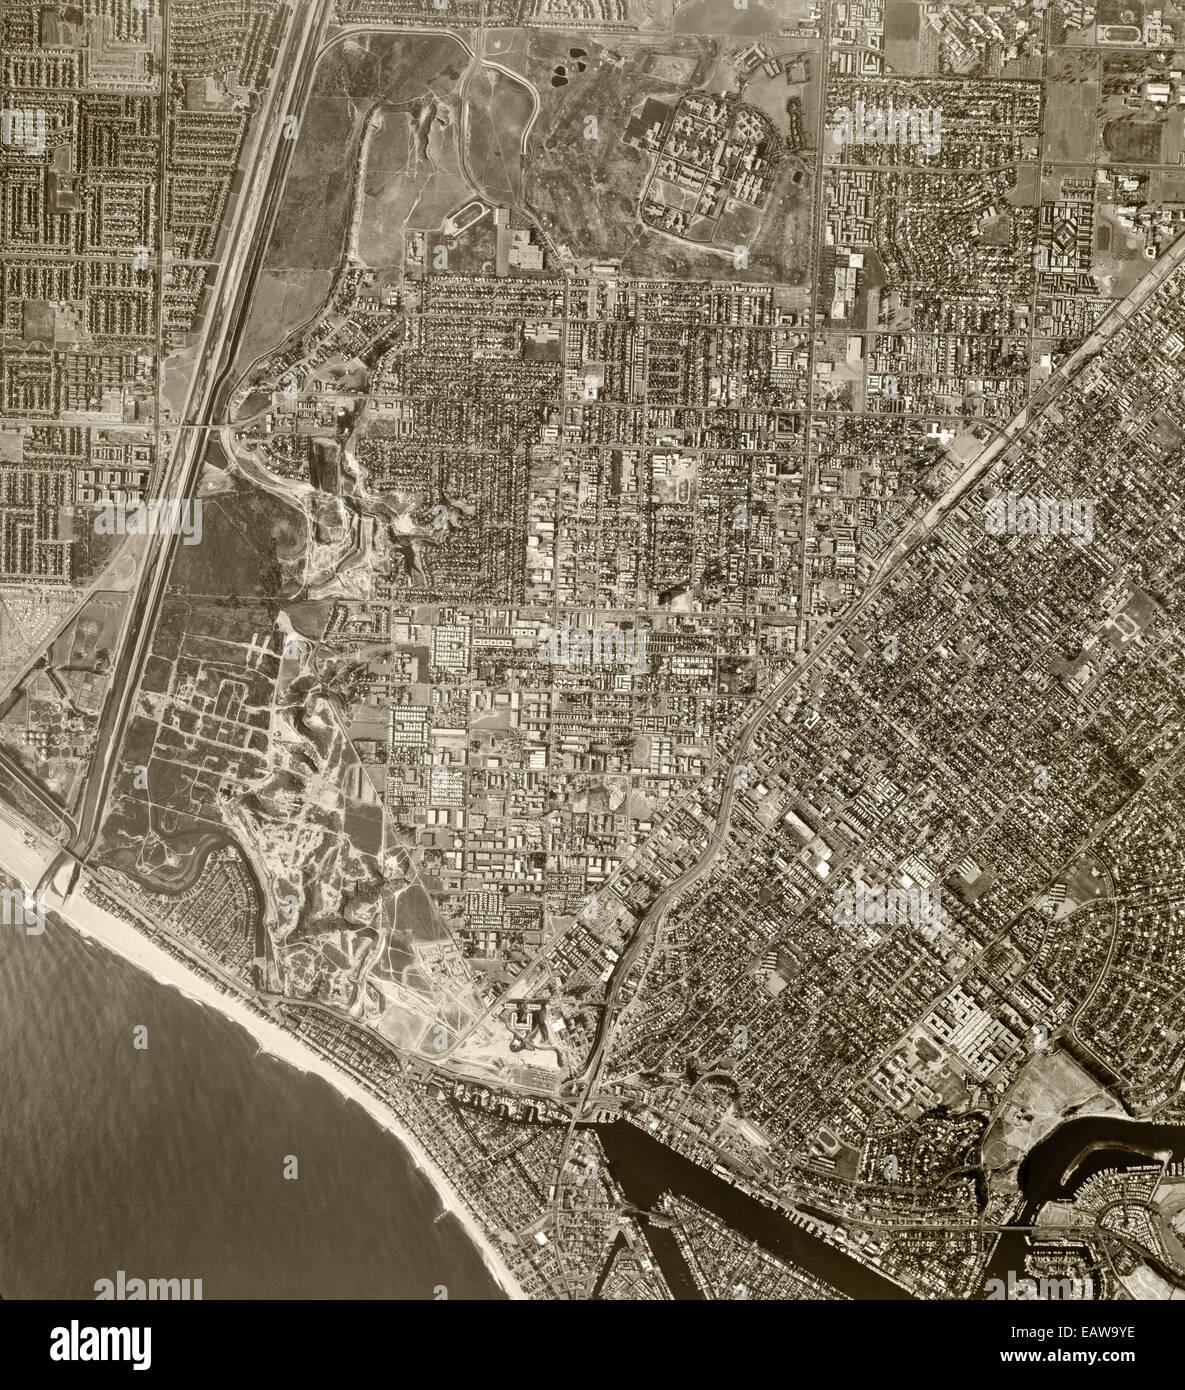 historical aerial photograph Costa Mesa, 1972 - Stock Image